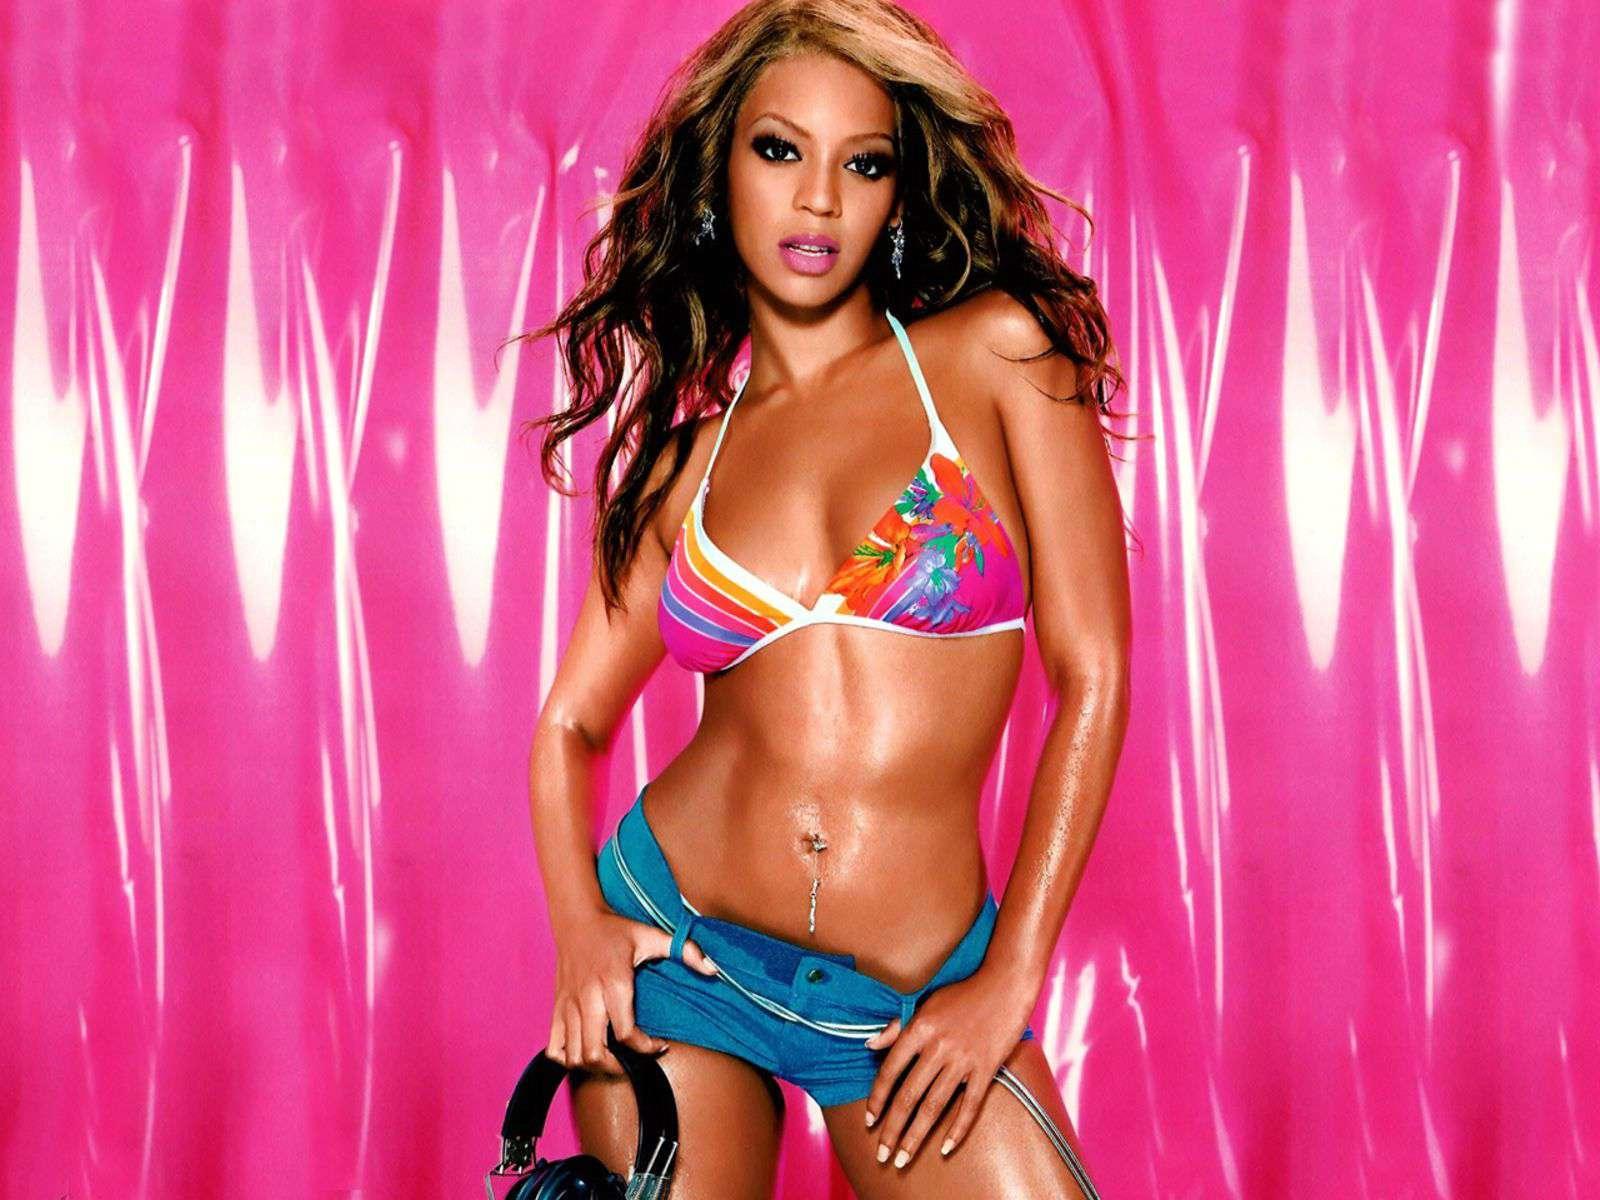 http://1.bp.blogspot.com/-s9UFAM74nn0/TiRe23jZsZI/AAAAAAAAILo/_oyzCqoD8OQ/s1600/Beyonce+-Knowles+-10.jpg